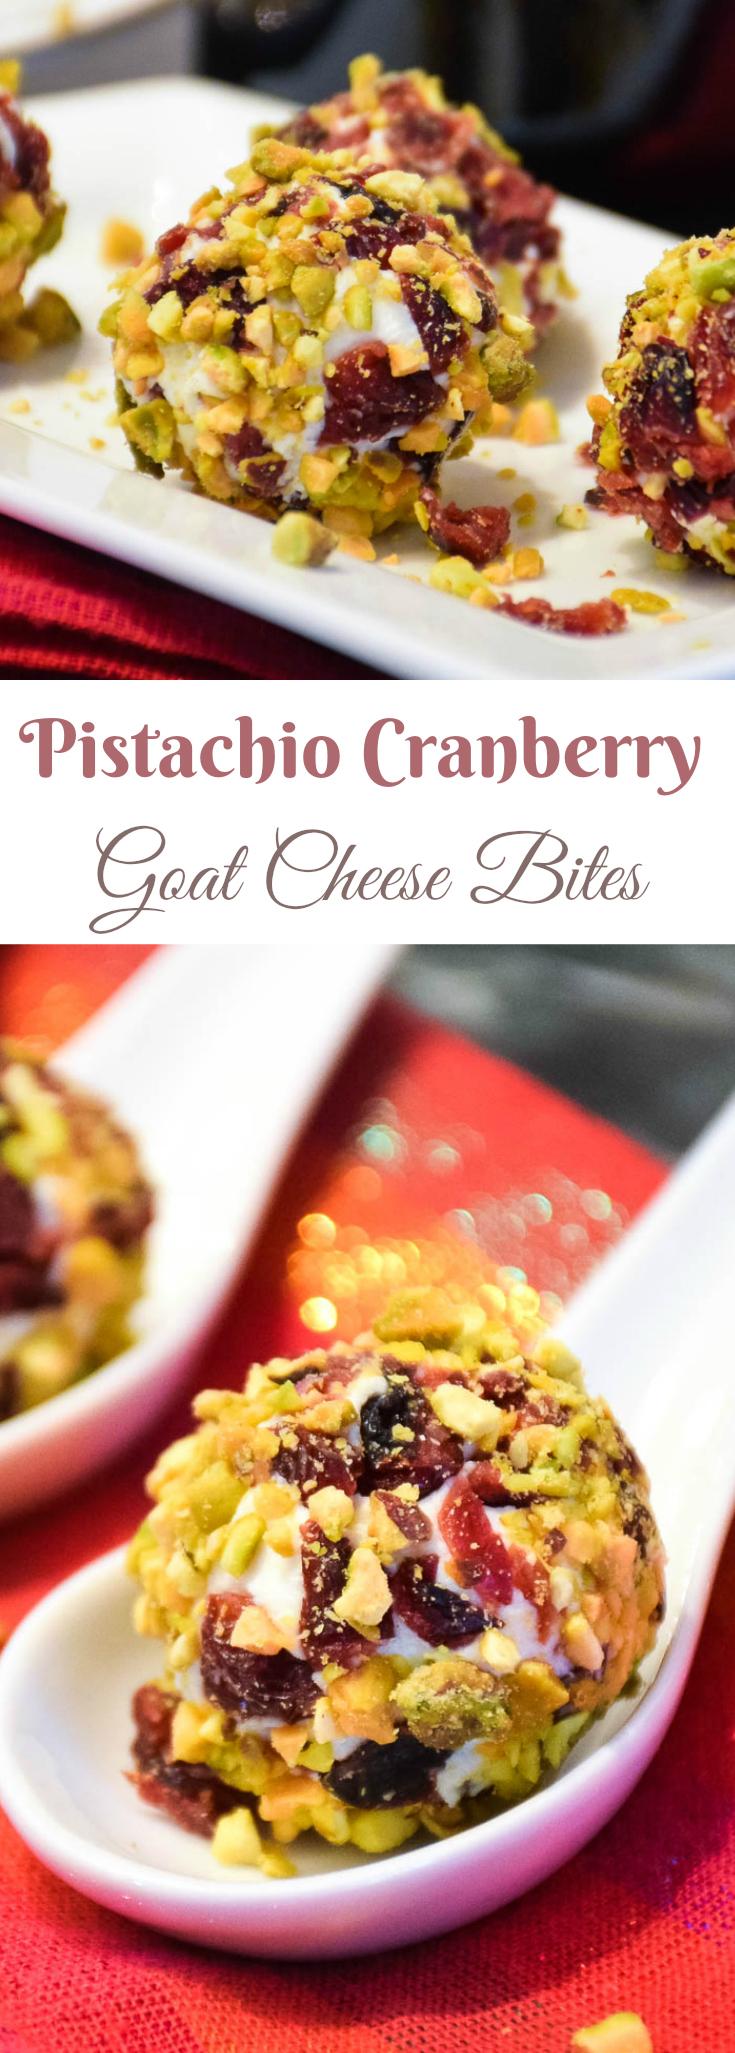 Cranberry Pistachio Goat Cheese Bites